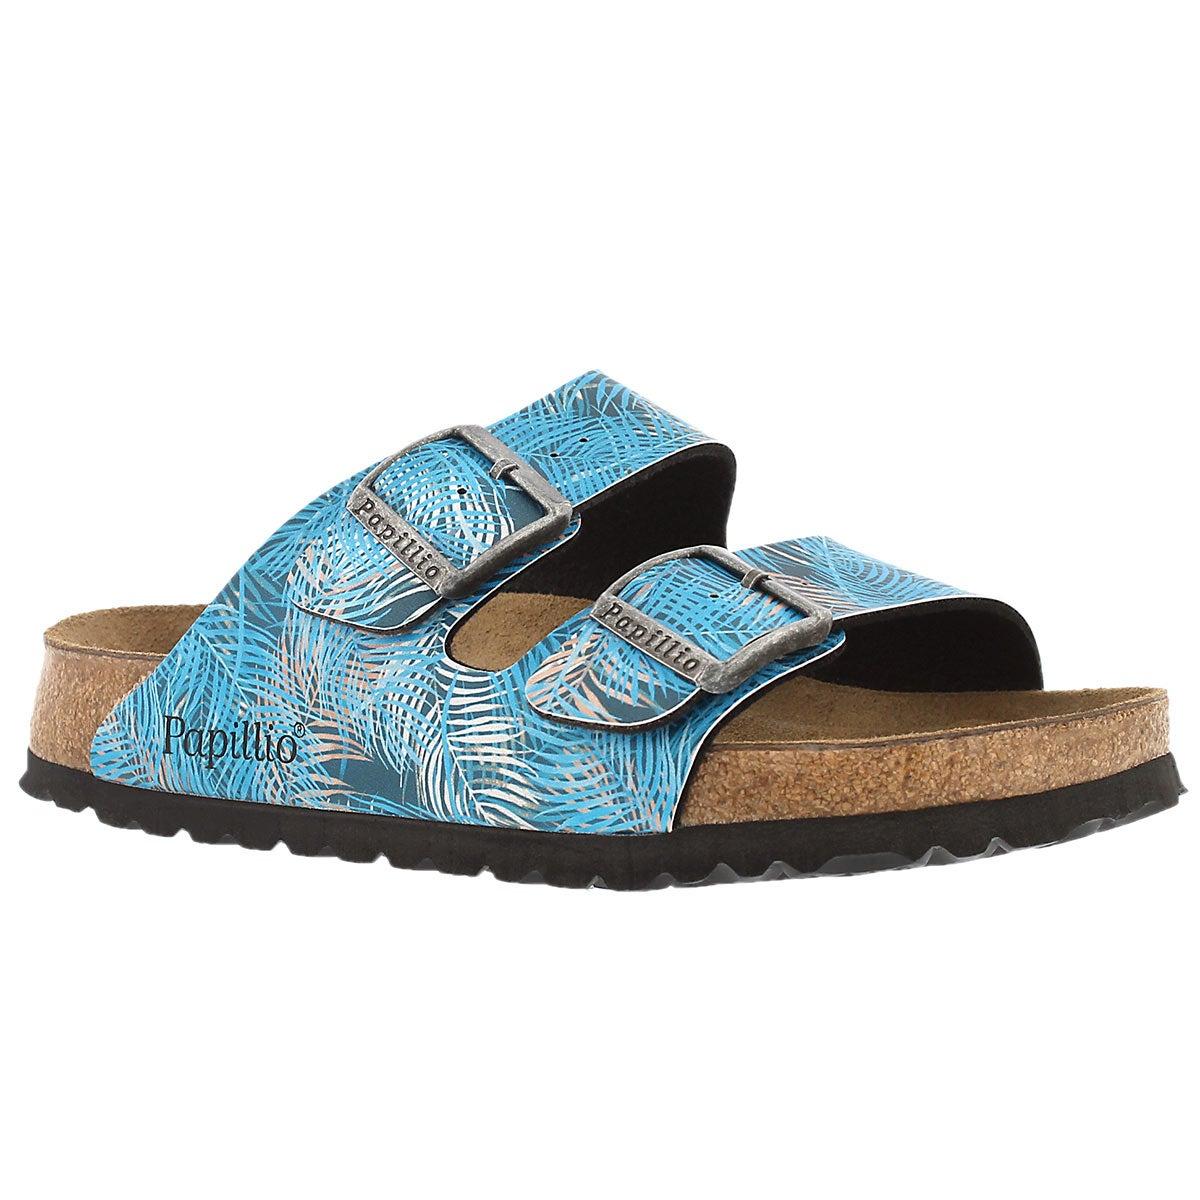 Sandale ARIZONA, bleu tropic, fem-Étroit